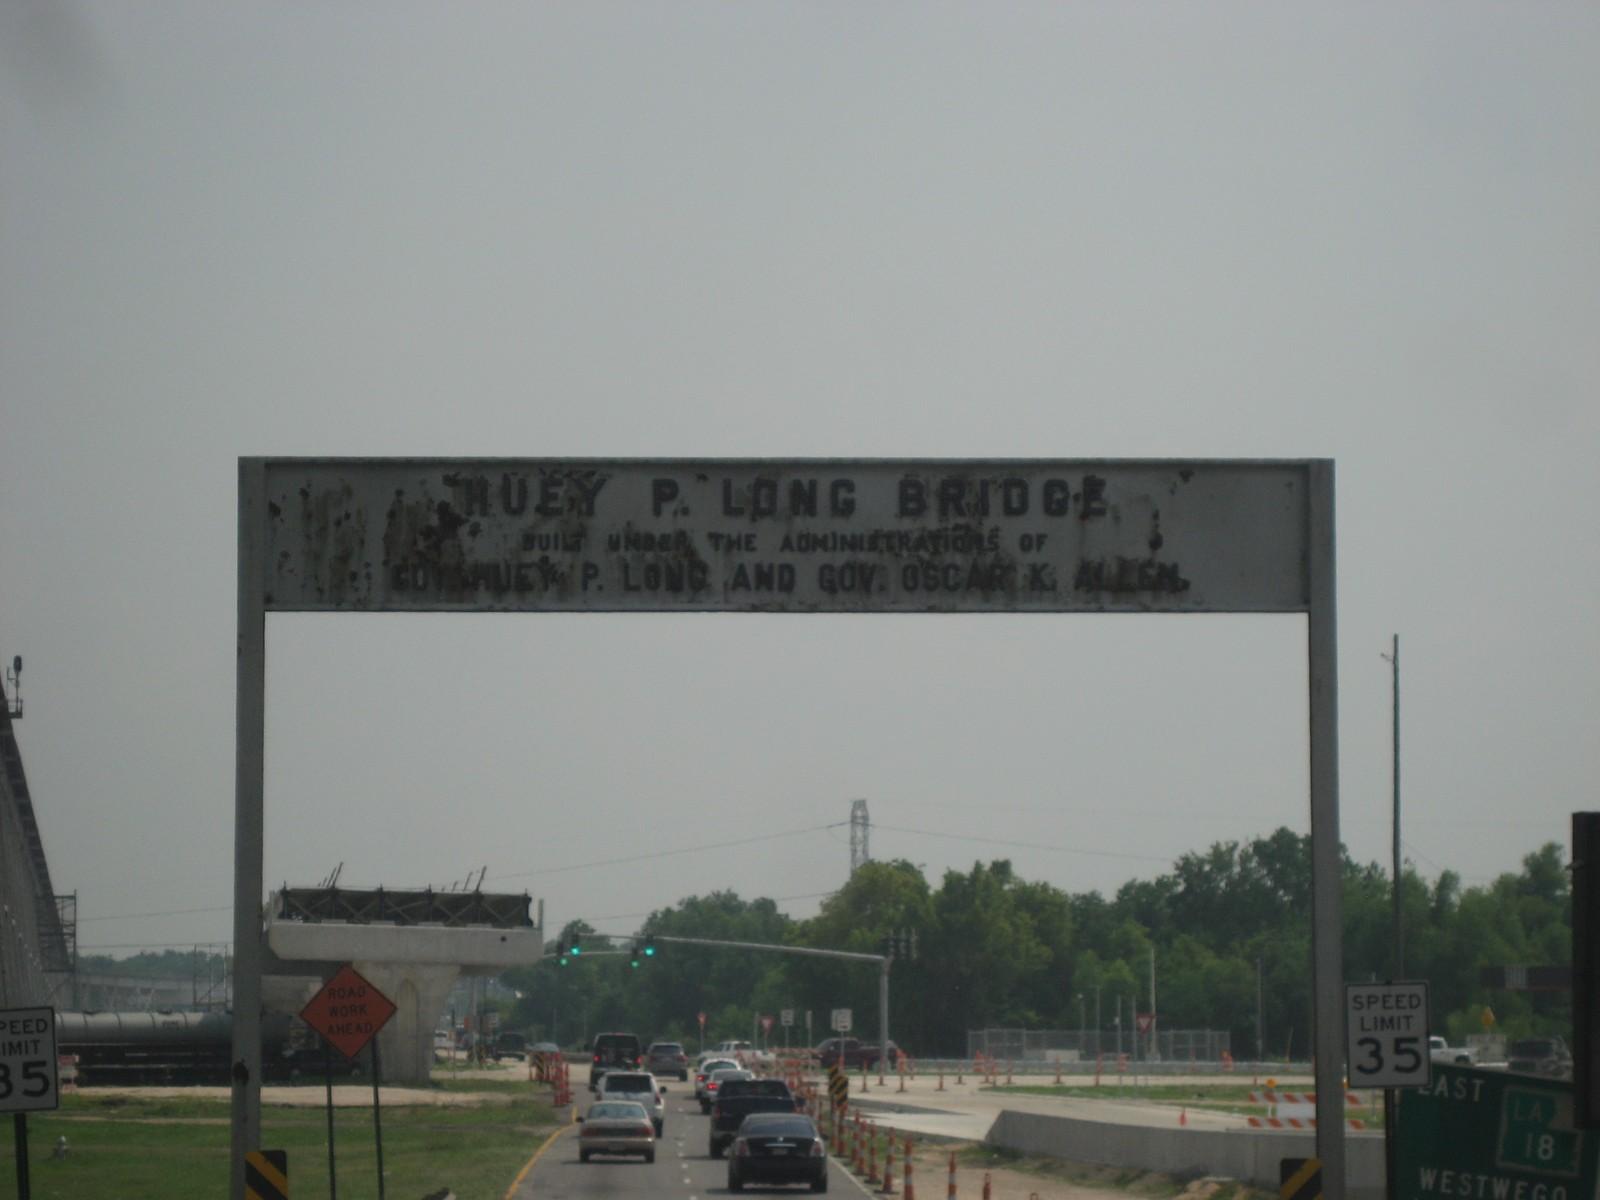 Huey P. Long Bridge Sign